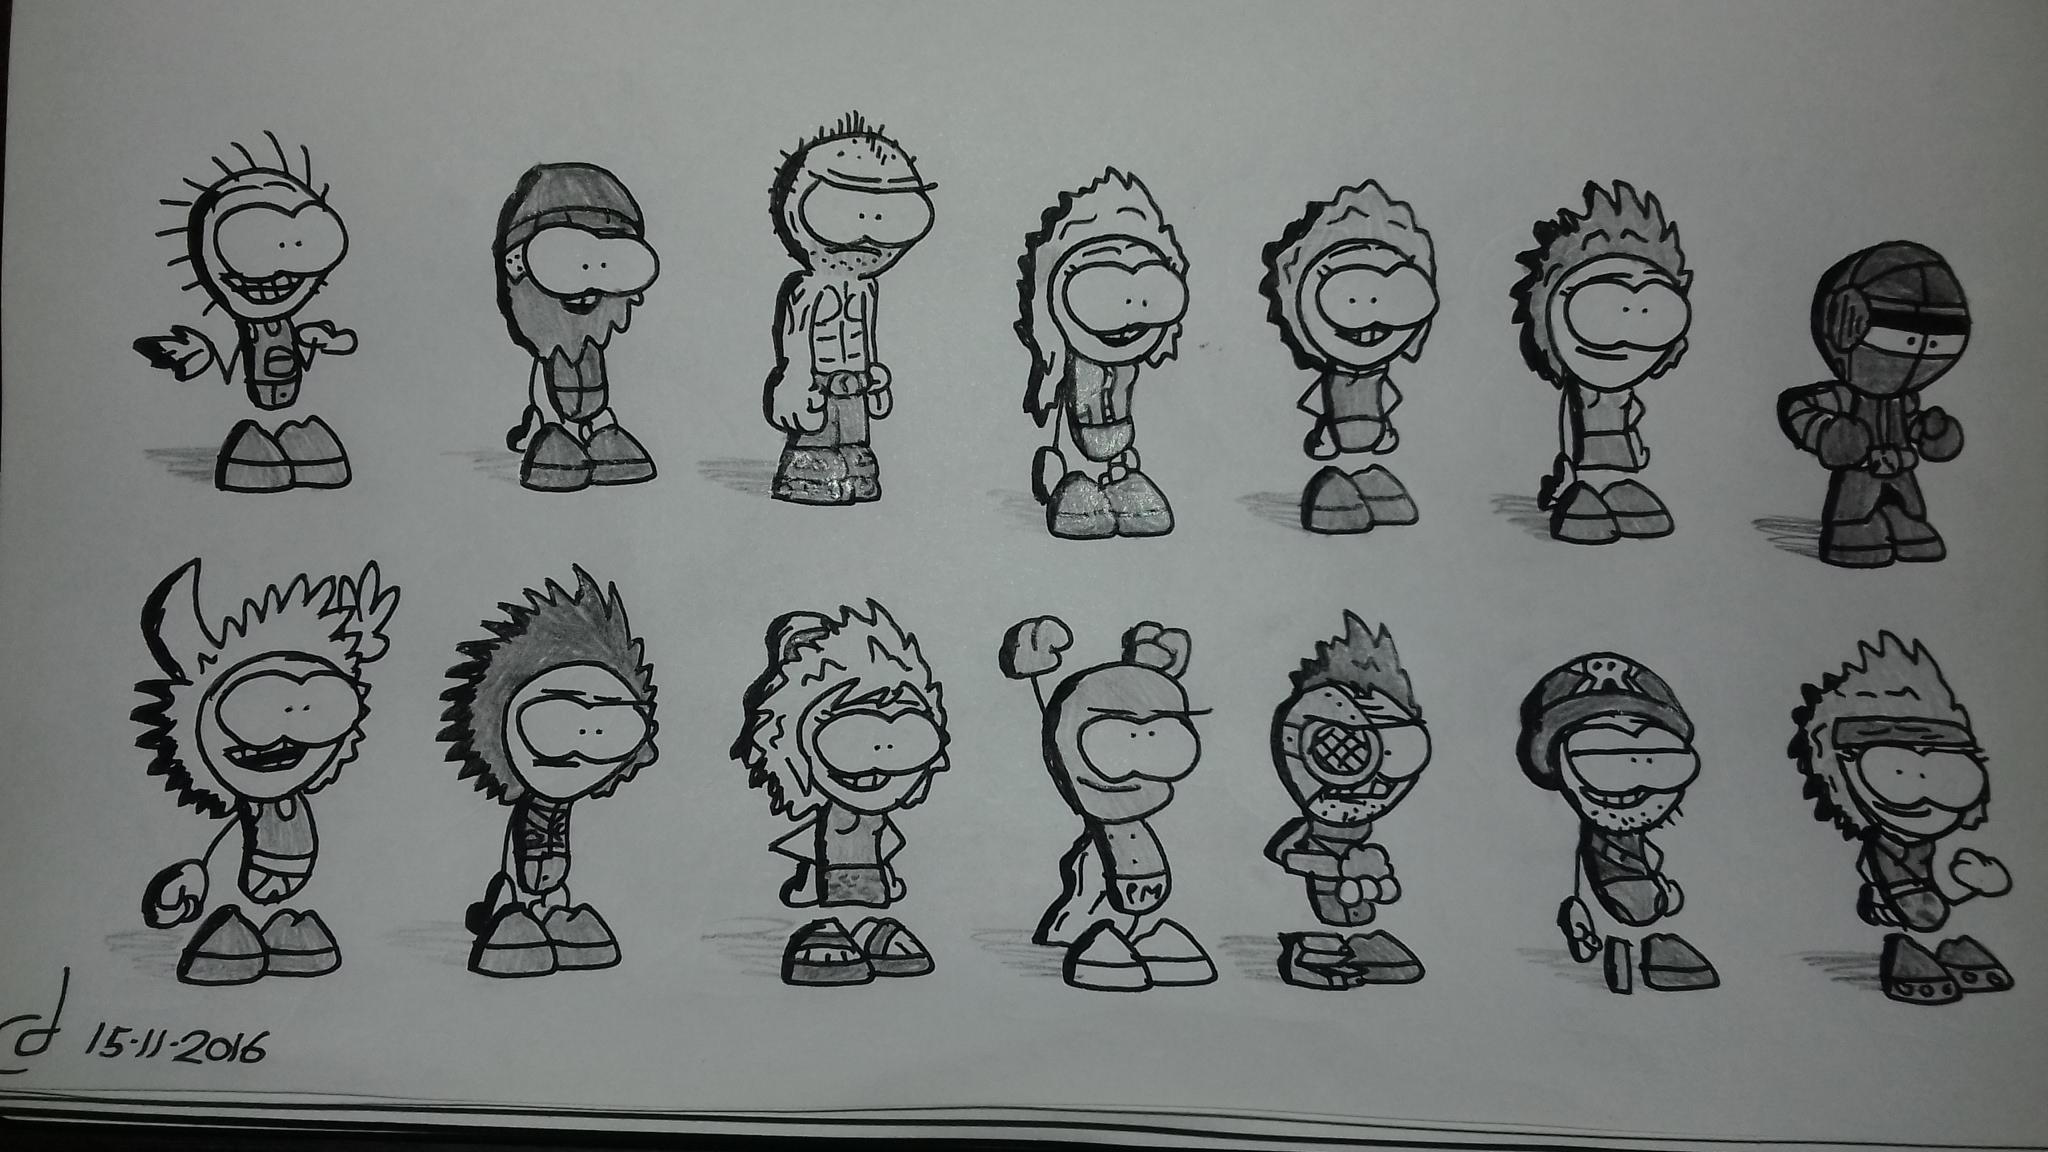 Some sketchin'